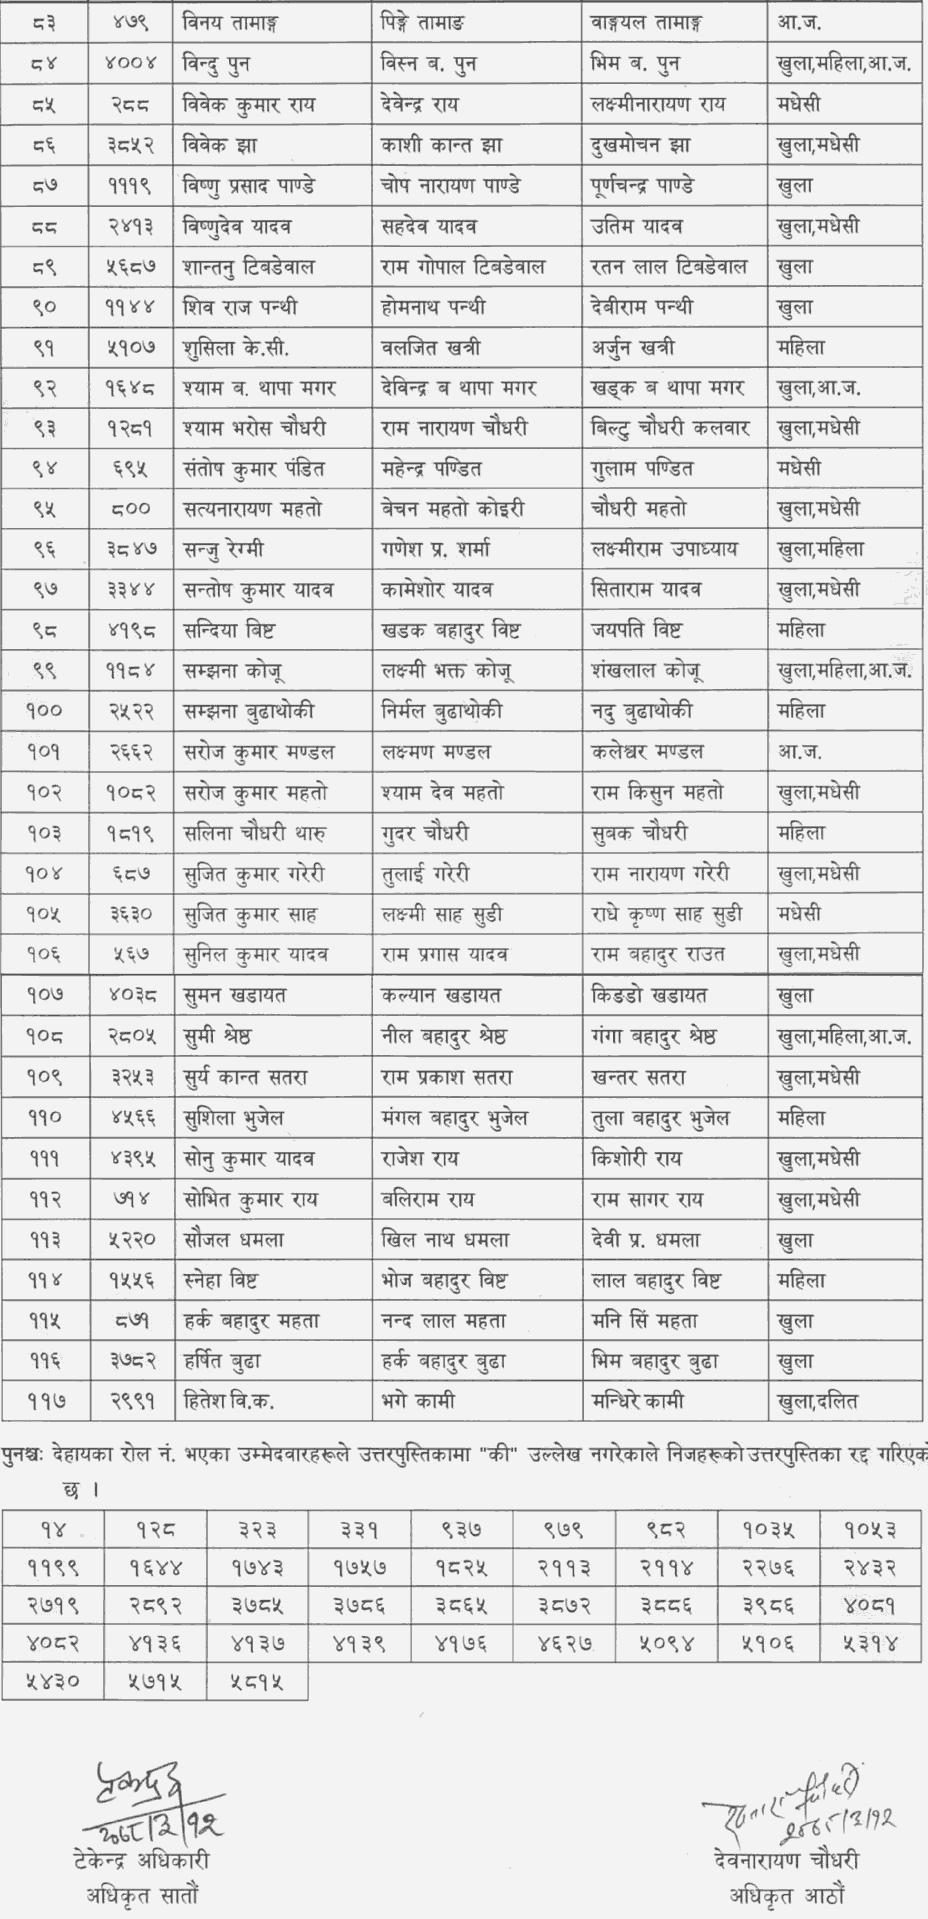 Bagmati Pradesh Lok Sewa Aayog Published Result of 4th Level Assistant Sub Engineer